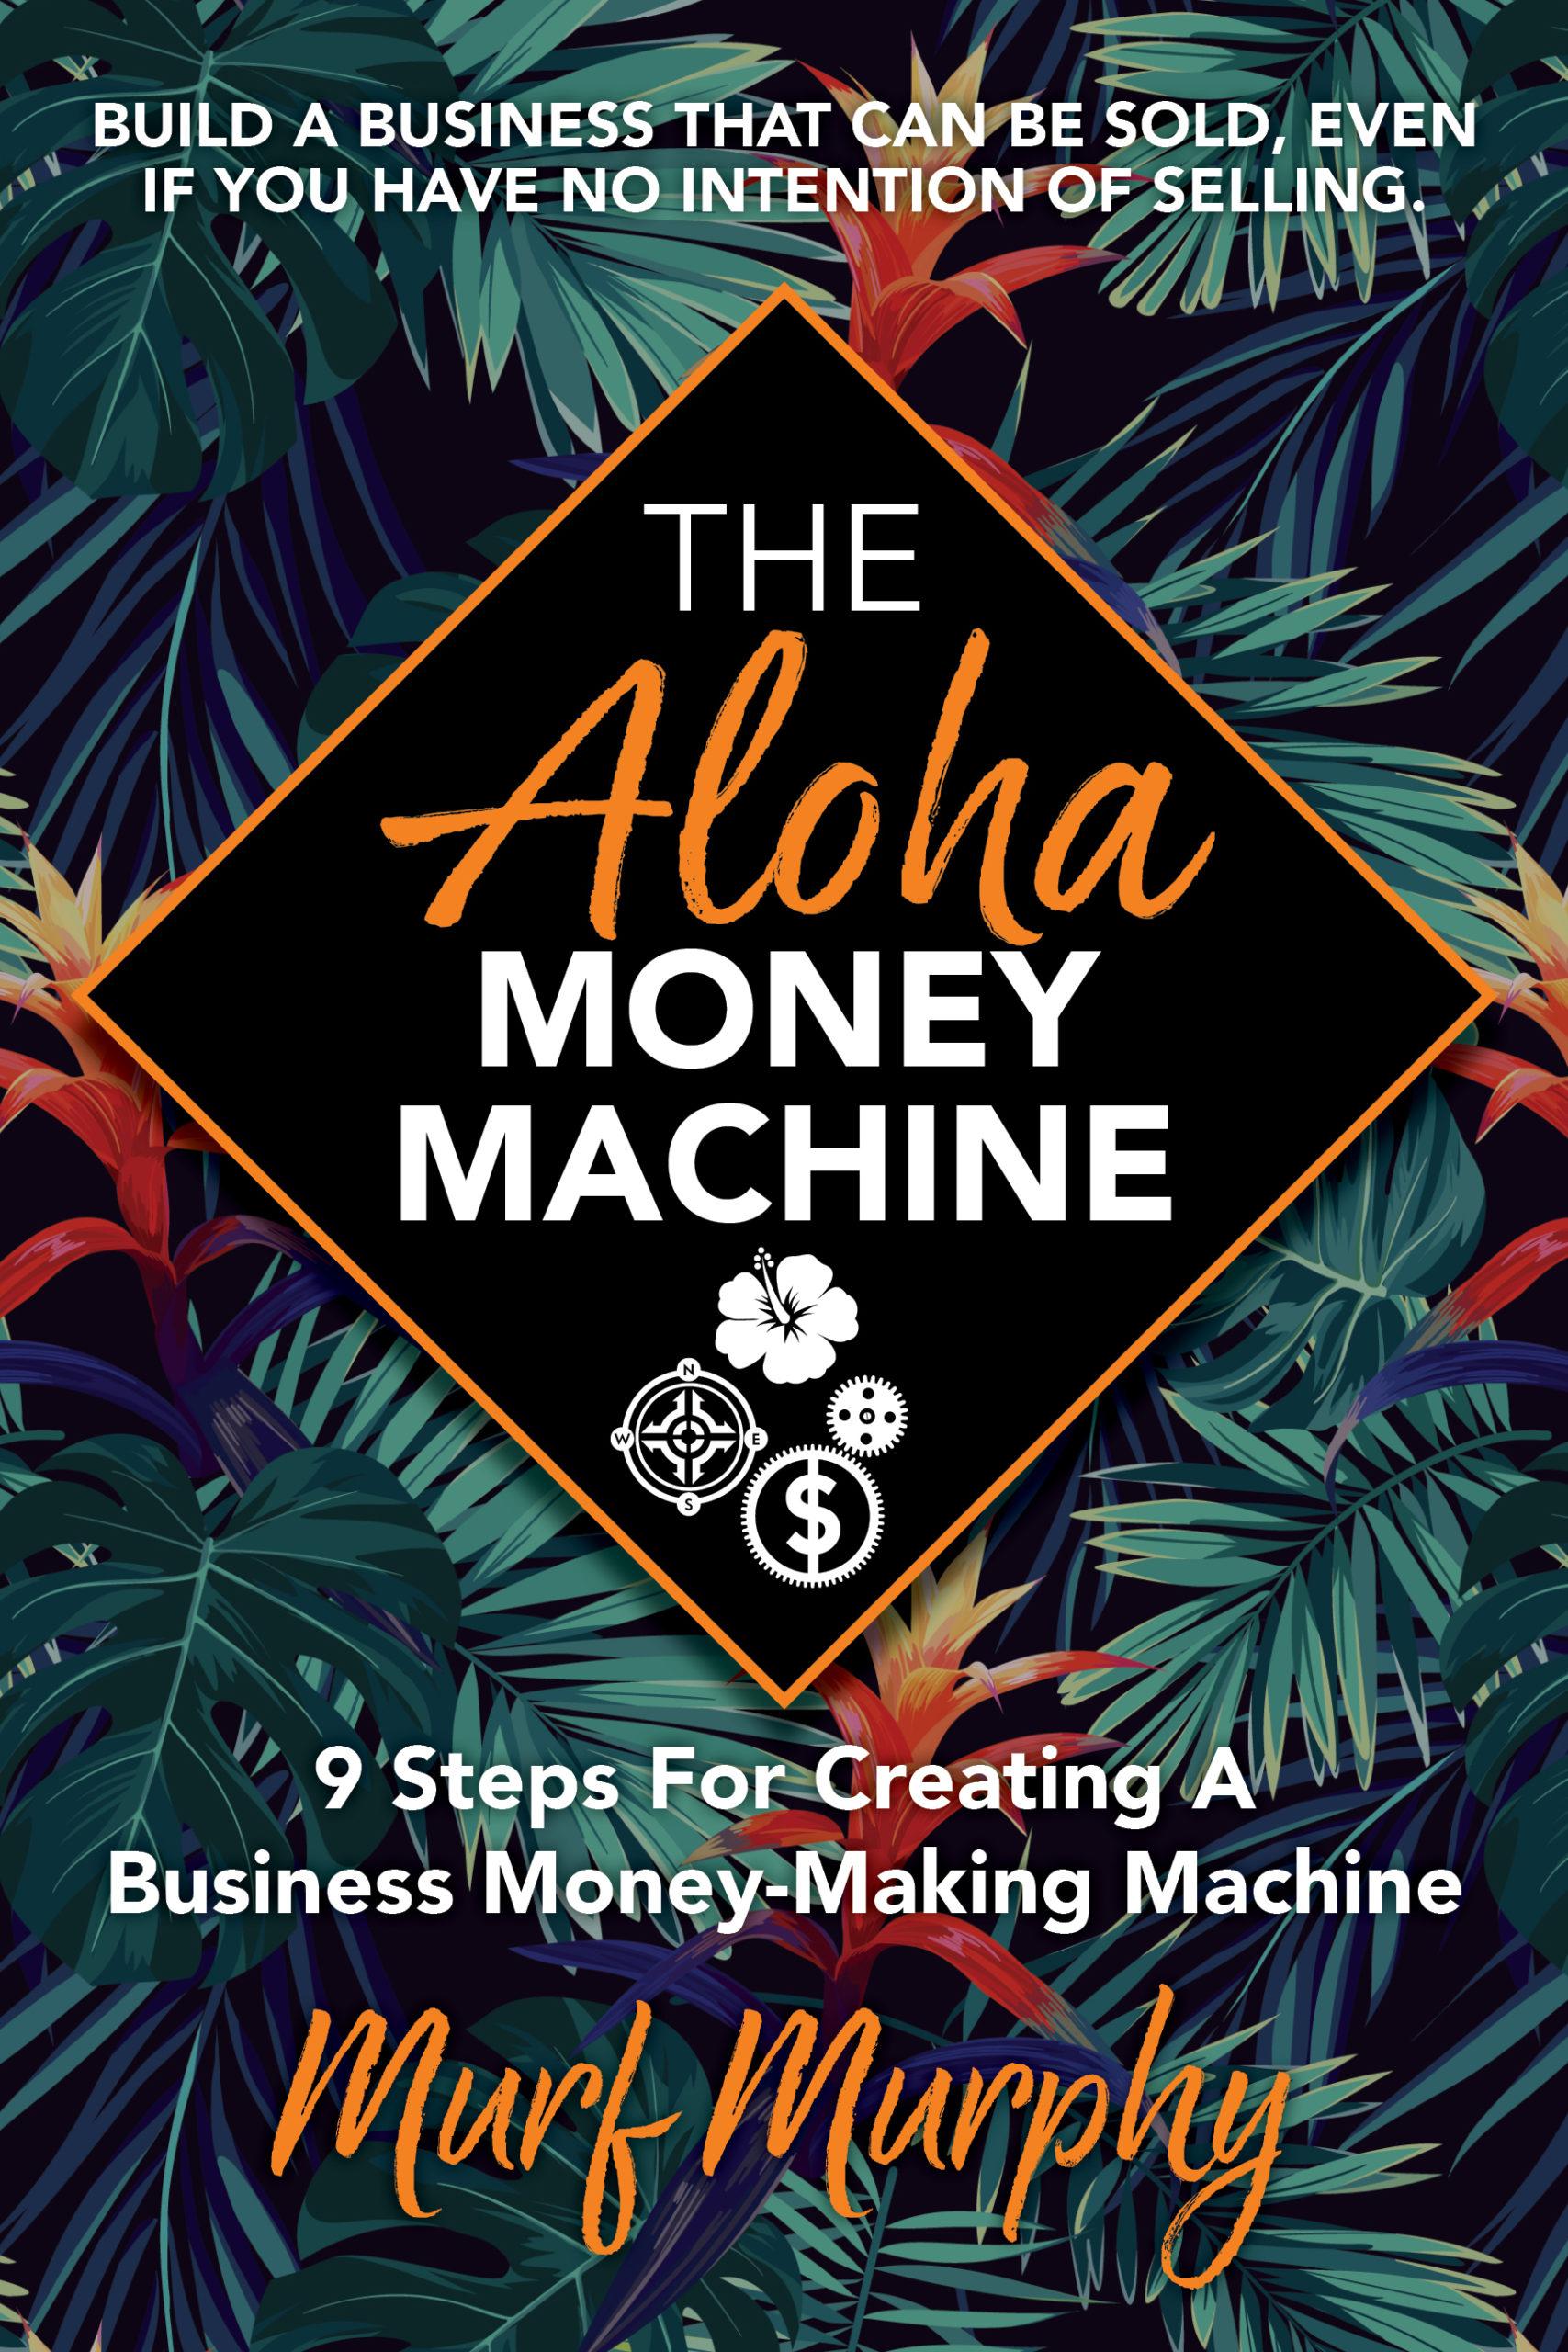 The Aloha Money Machine